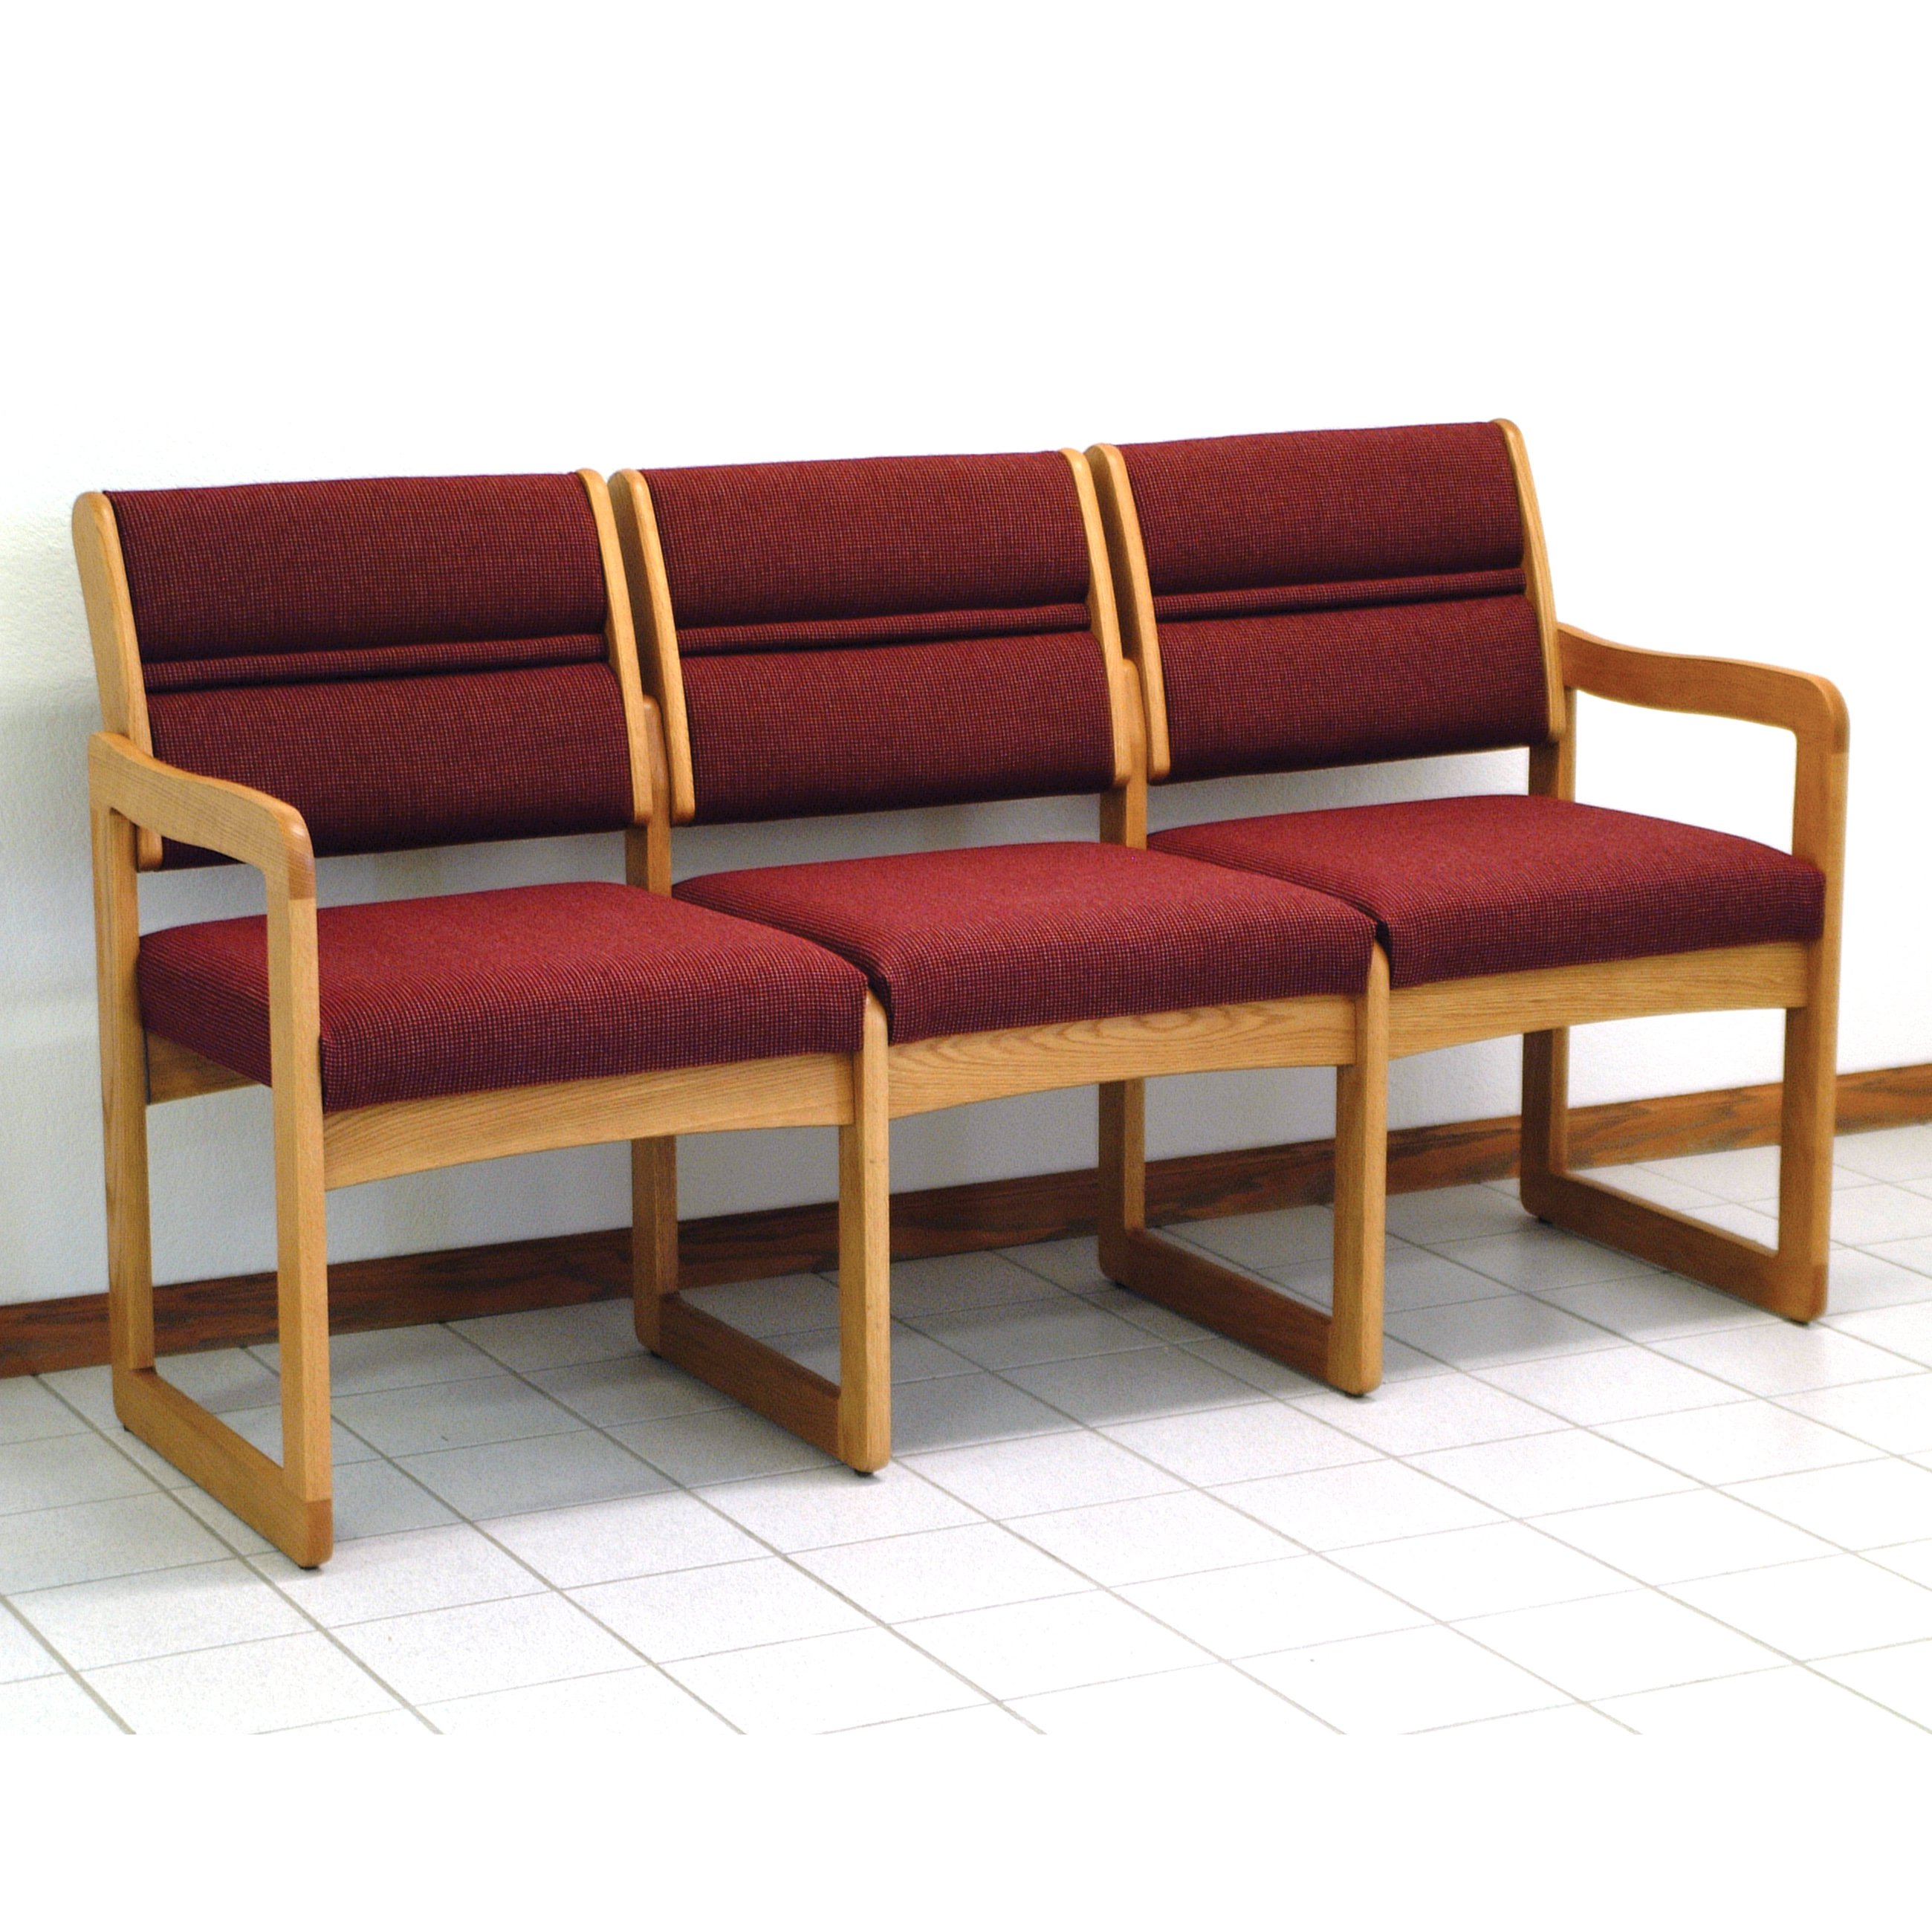 Wooden Mallet DW2-3 Solid Oak Sled Base 3-Seat Sofa